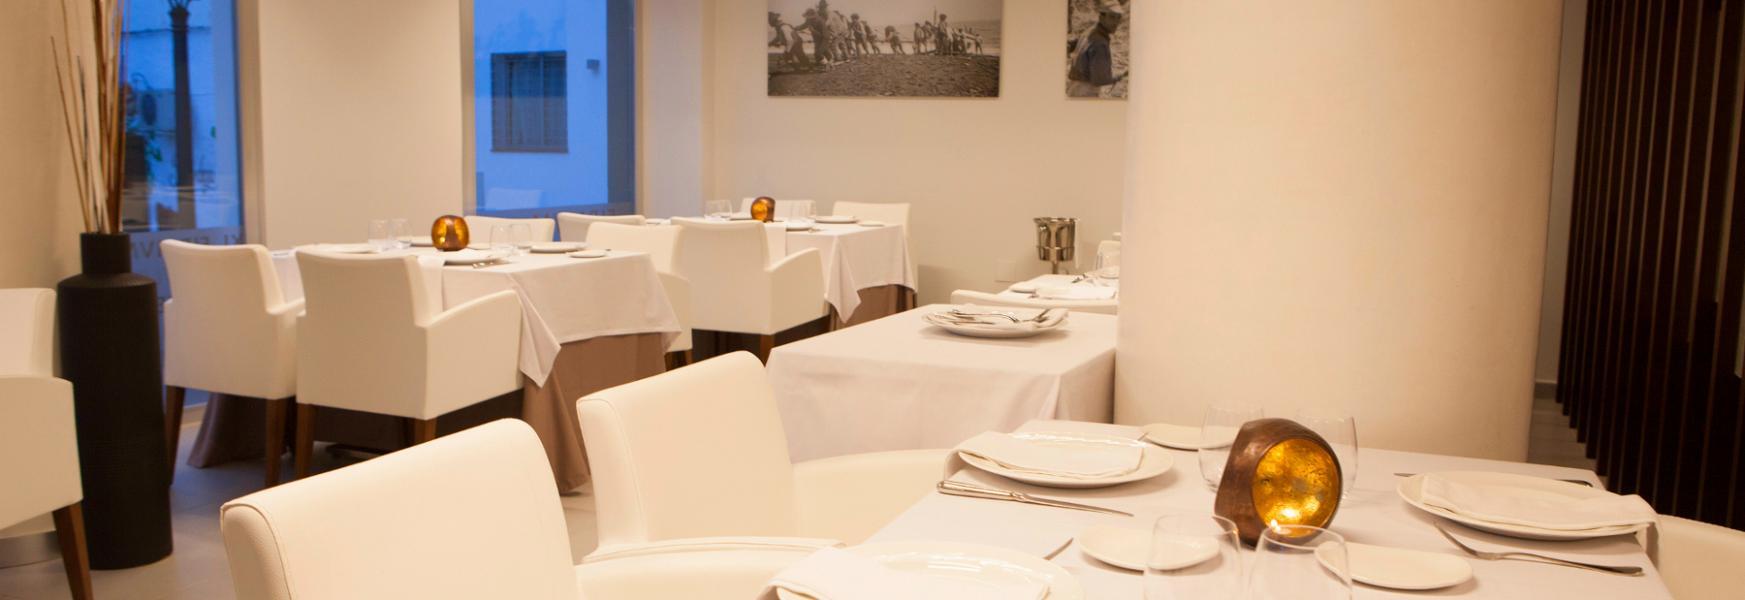 Restaurante Firmvm Almuñecar. Menu Degustacion